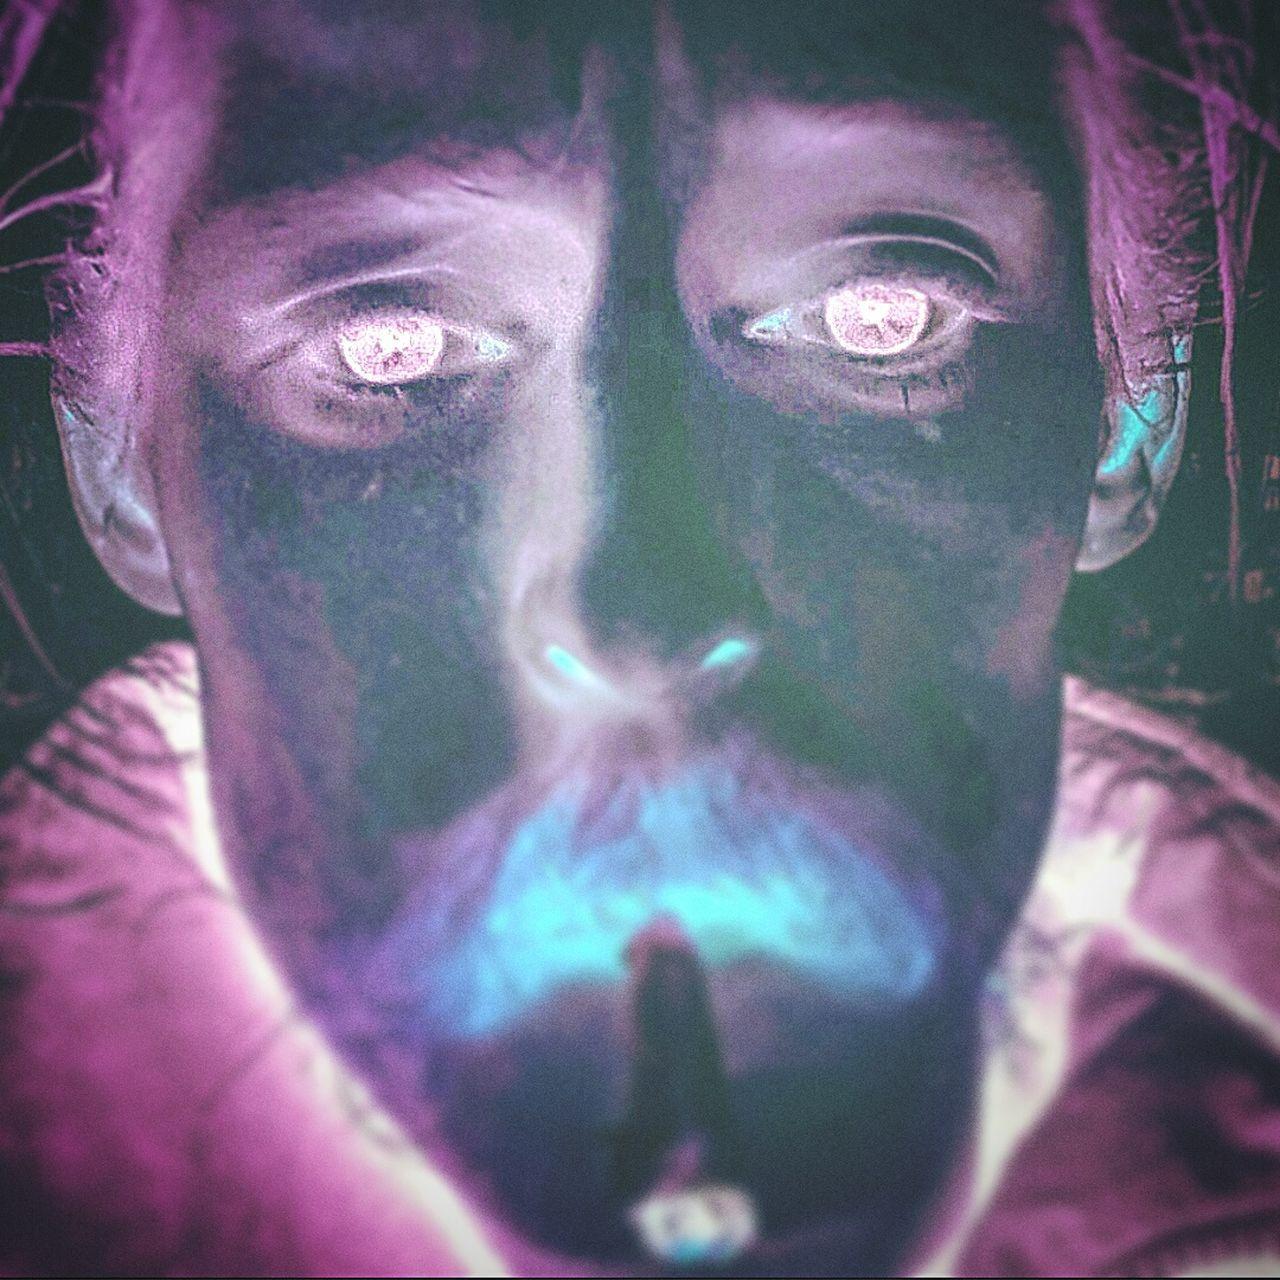 Hello World That's Me Smoking Weed Feel Like Diyng Enjoying Life